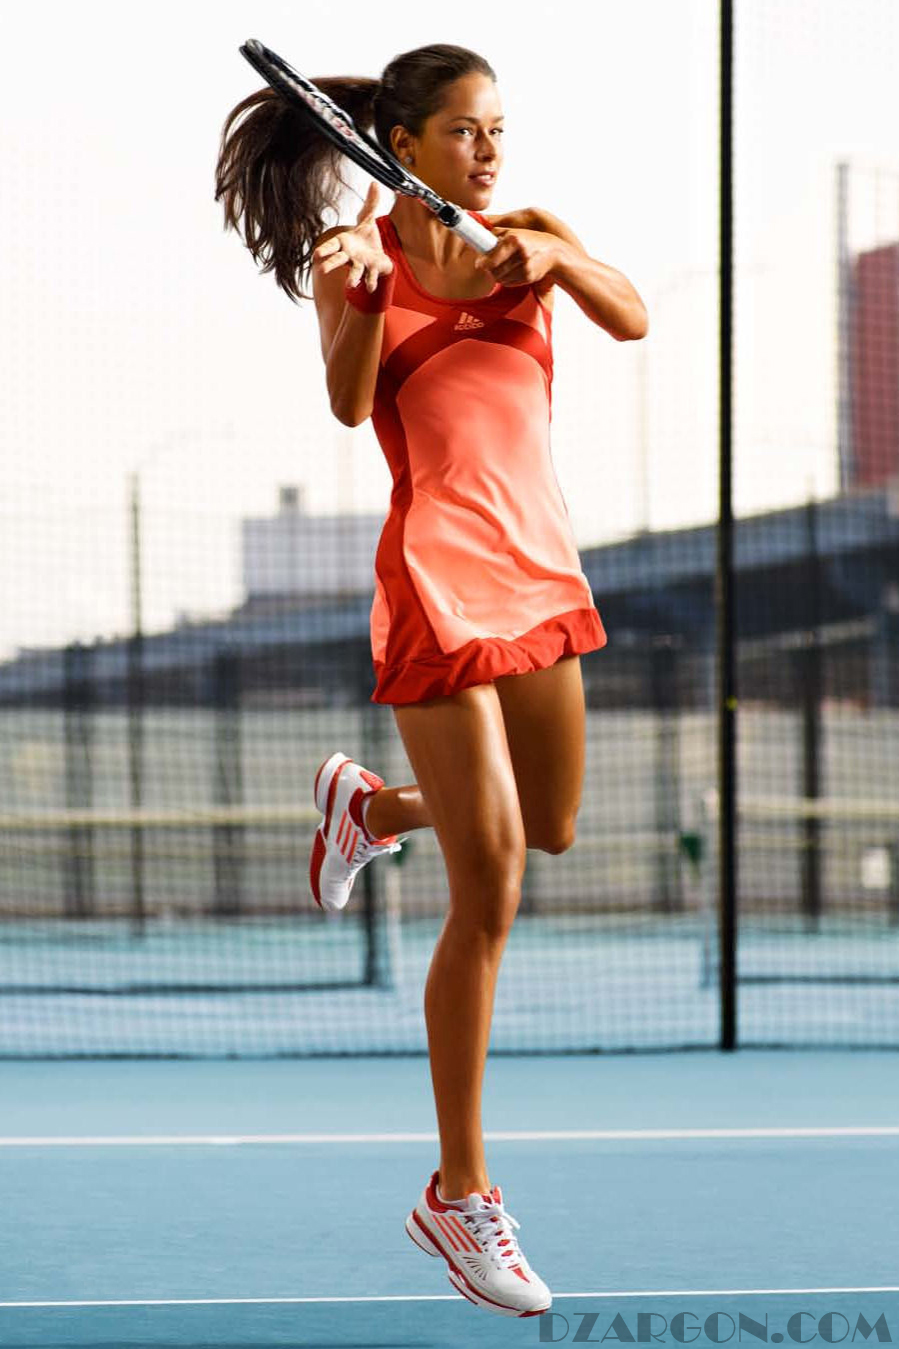 4. Ana ivanovic (Petenis)  Penghasilan Tahunan : $ 6.500.000 ( Rp. 84.500.000.000)  Twitter Followers :588,795  Harga Endorse per Twit : $ 2,759 ( Rp. 35.867.000)  Merek : Adidas, Rolex, Juicy Plus,  samsung, dan Dubai Duty Free   Atlit cantik pada olahraga tennis pernah memenangkan 15 gelar juara termasuk turnamen terbuka Perancis pada tahun 2008. Ana Ivanovic merupakan atlit cantik seperti model yang juga mengukir tahun emasnya pada tahun 2014 dengan meraih 4 gelar juara pada ajang tenis dunia.